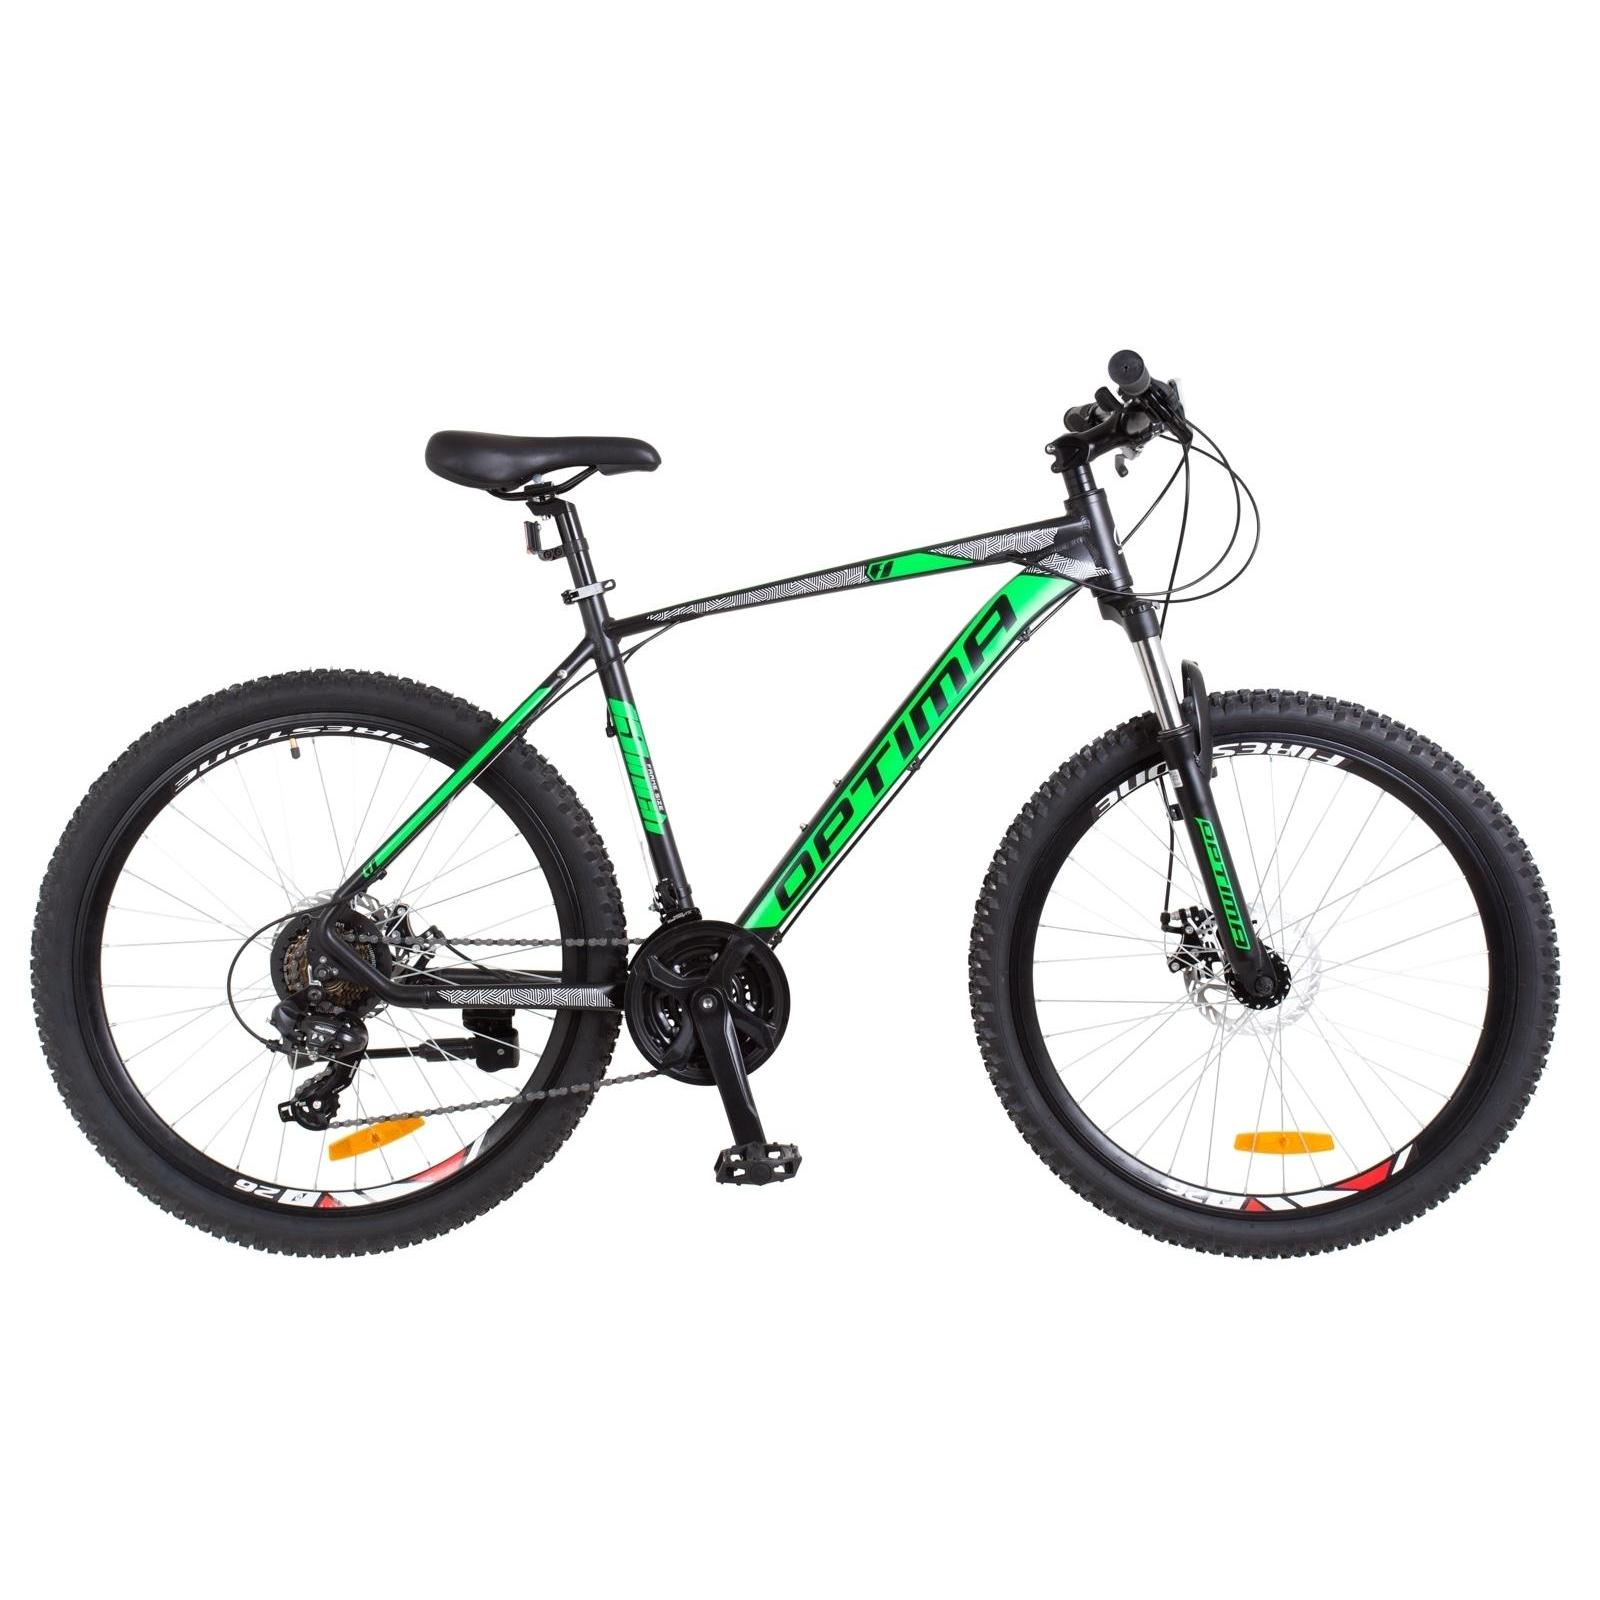 "Велосипед Optimabikes 29"" F-1 2018 AM 14G DD рама-21"" Al черно-зеленый (OPS-OP-29-058)"